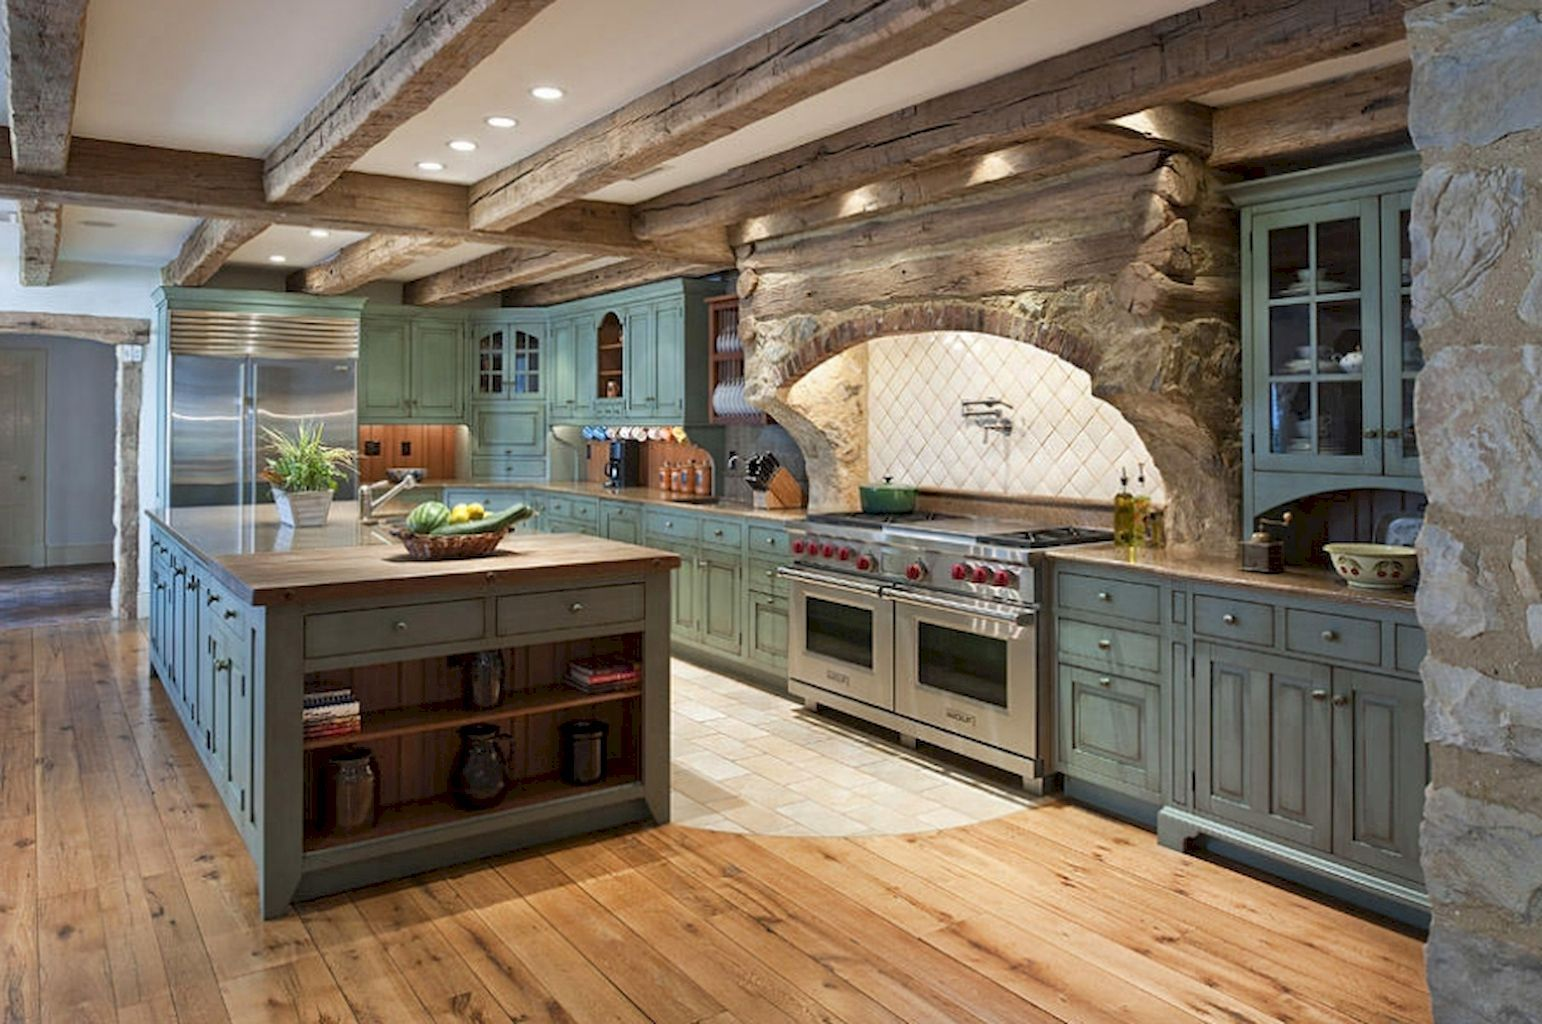 modern farmhouse kitchen design. 40 Rustic Modern Farmhouse Kitchen Design Ideas W